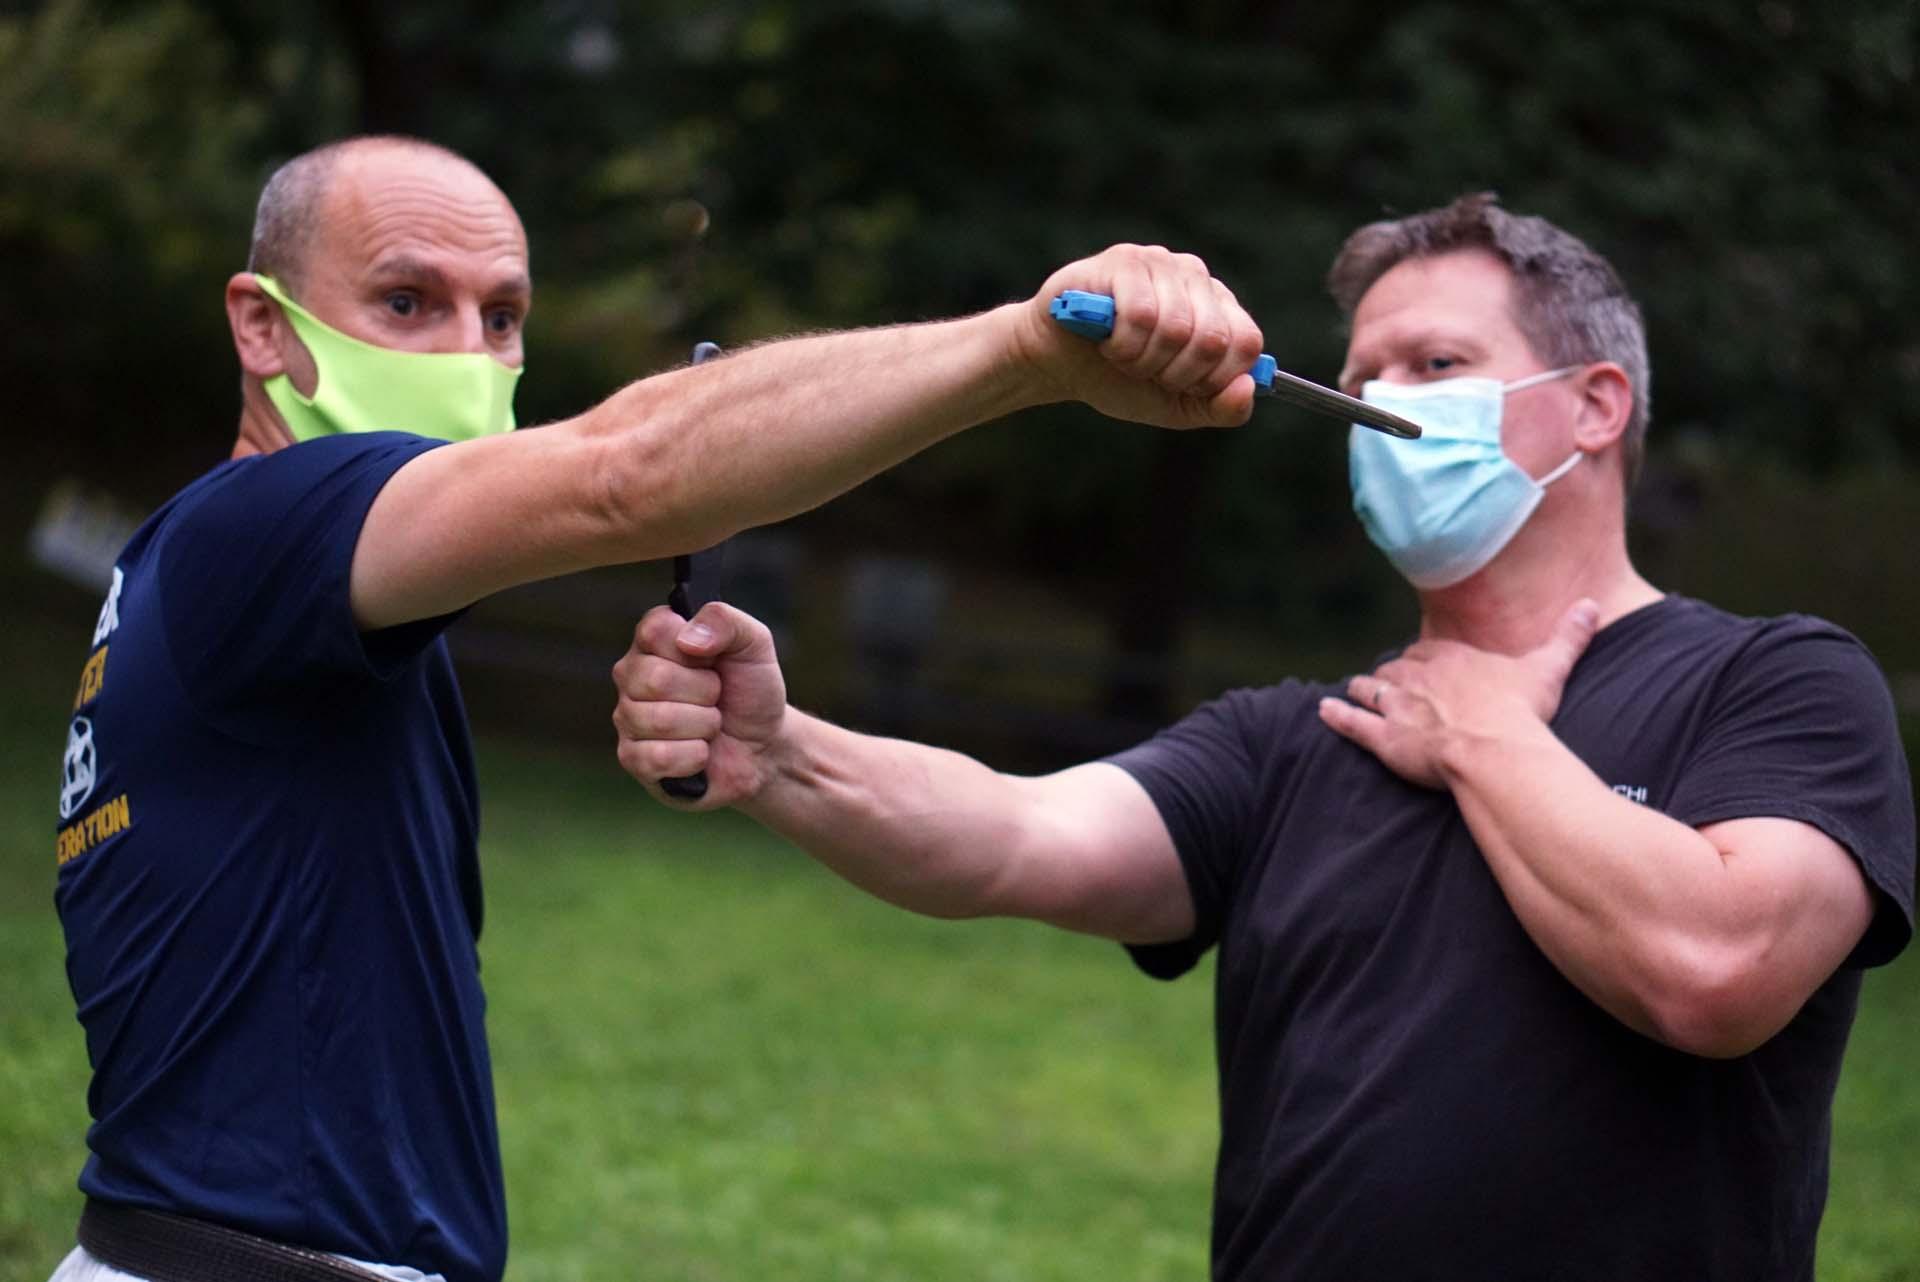 2021 August 4th - Outdoor Shotokan Karate & Krav Maga Self-Defense Classes at Thomas Paine Cottage